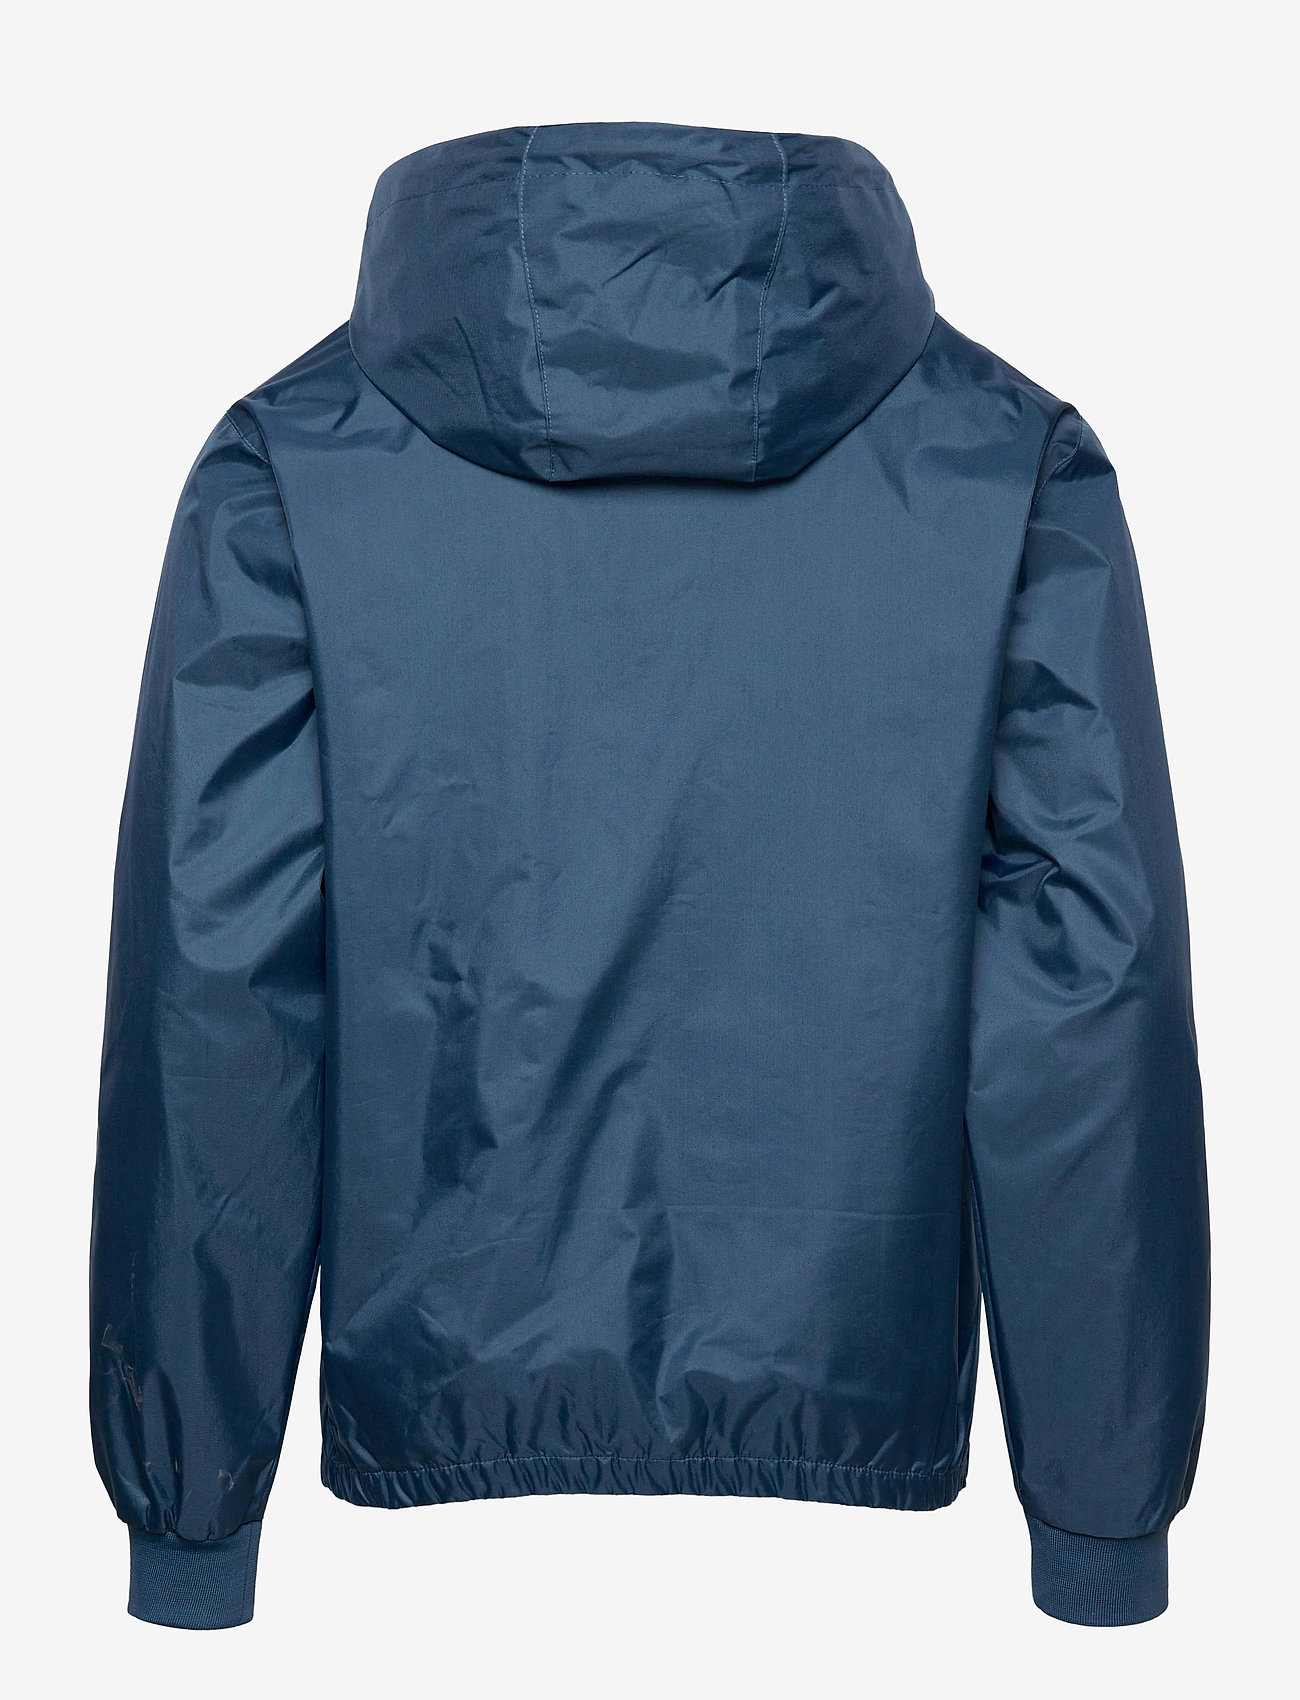 Blend - Outerwear - light jackets - dark denim - 1